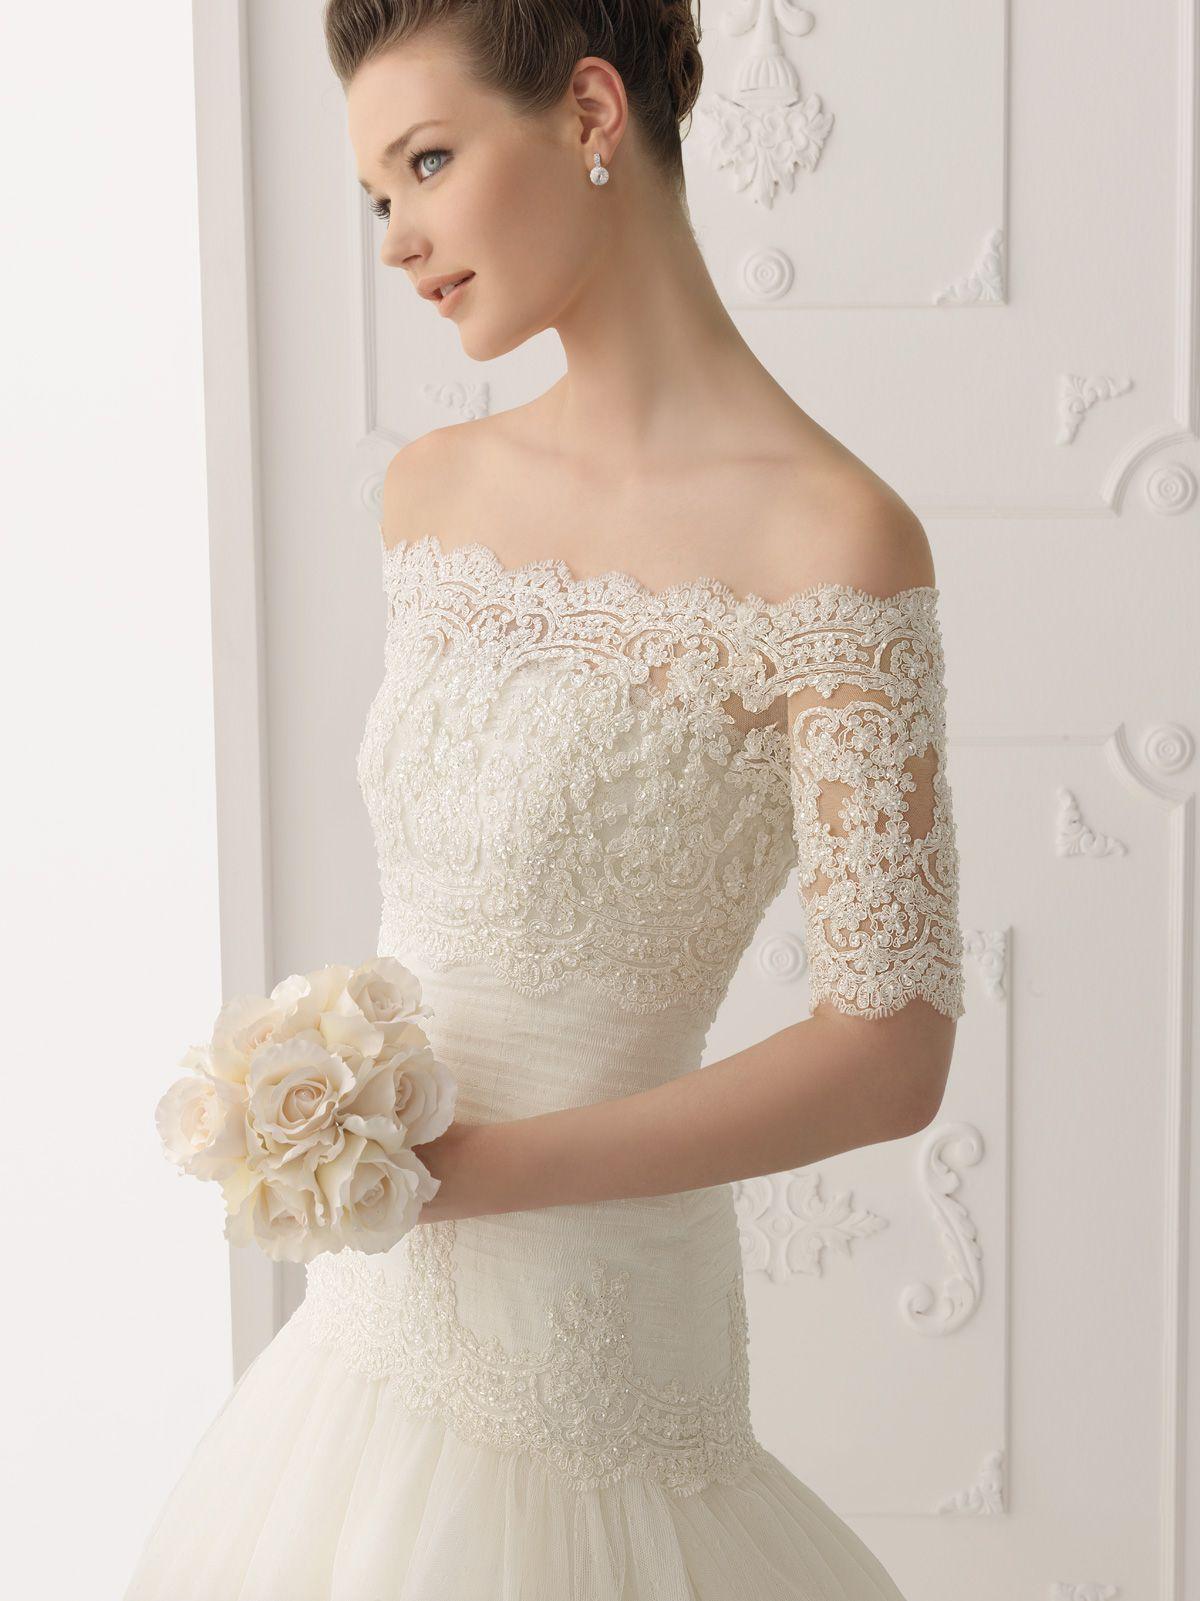 Sabina wedding dresses collection alma novia shown with